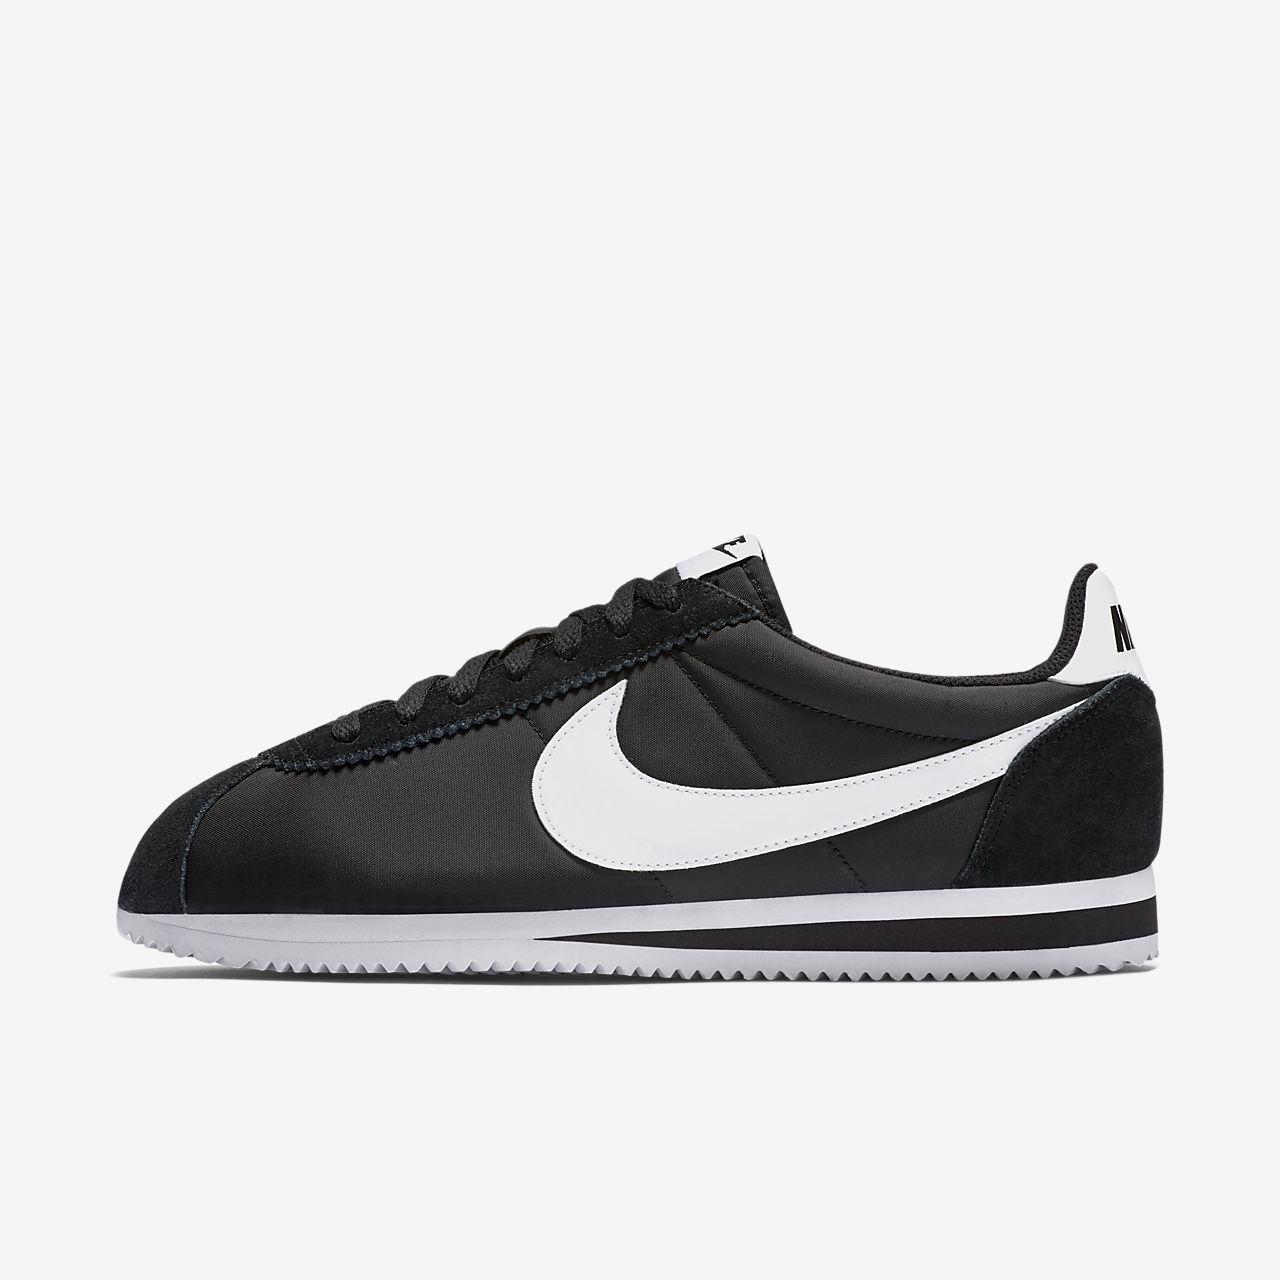 scarpe nike uomo 2018 classic